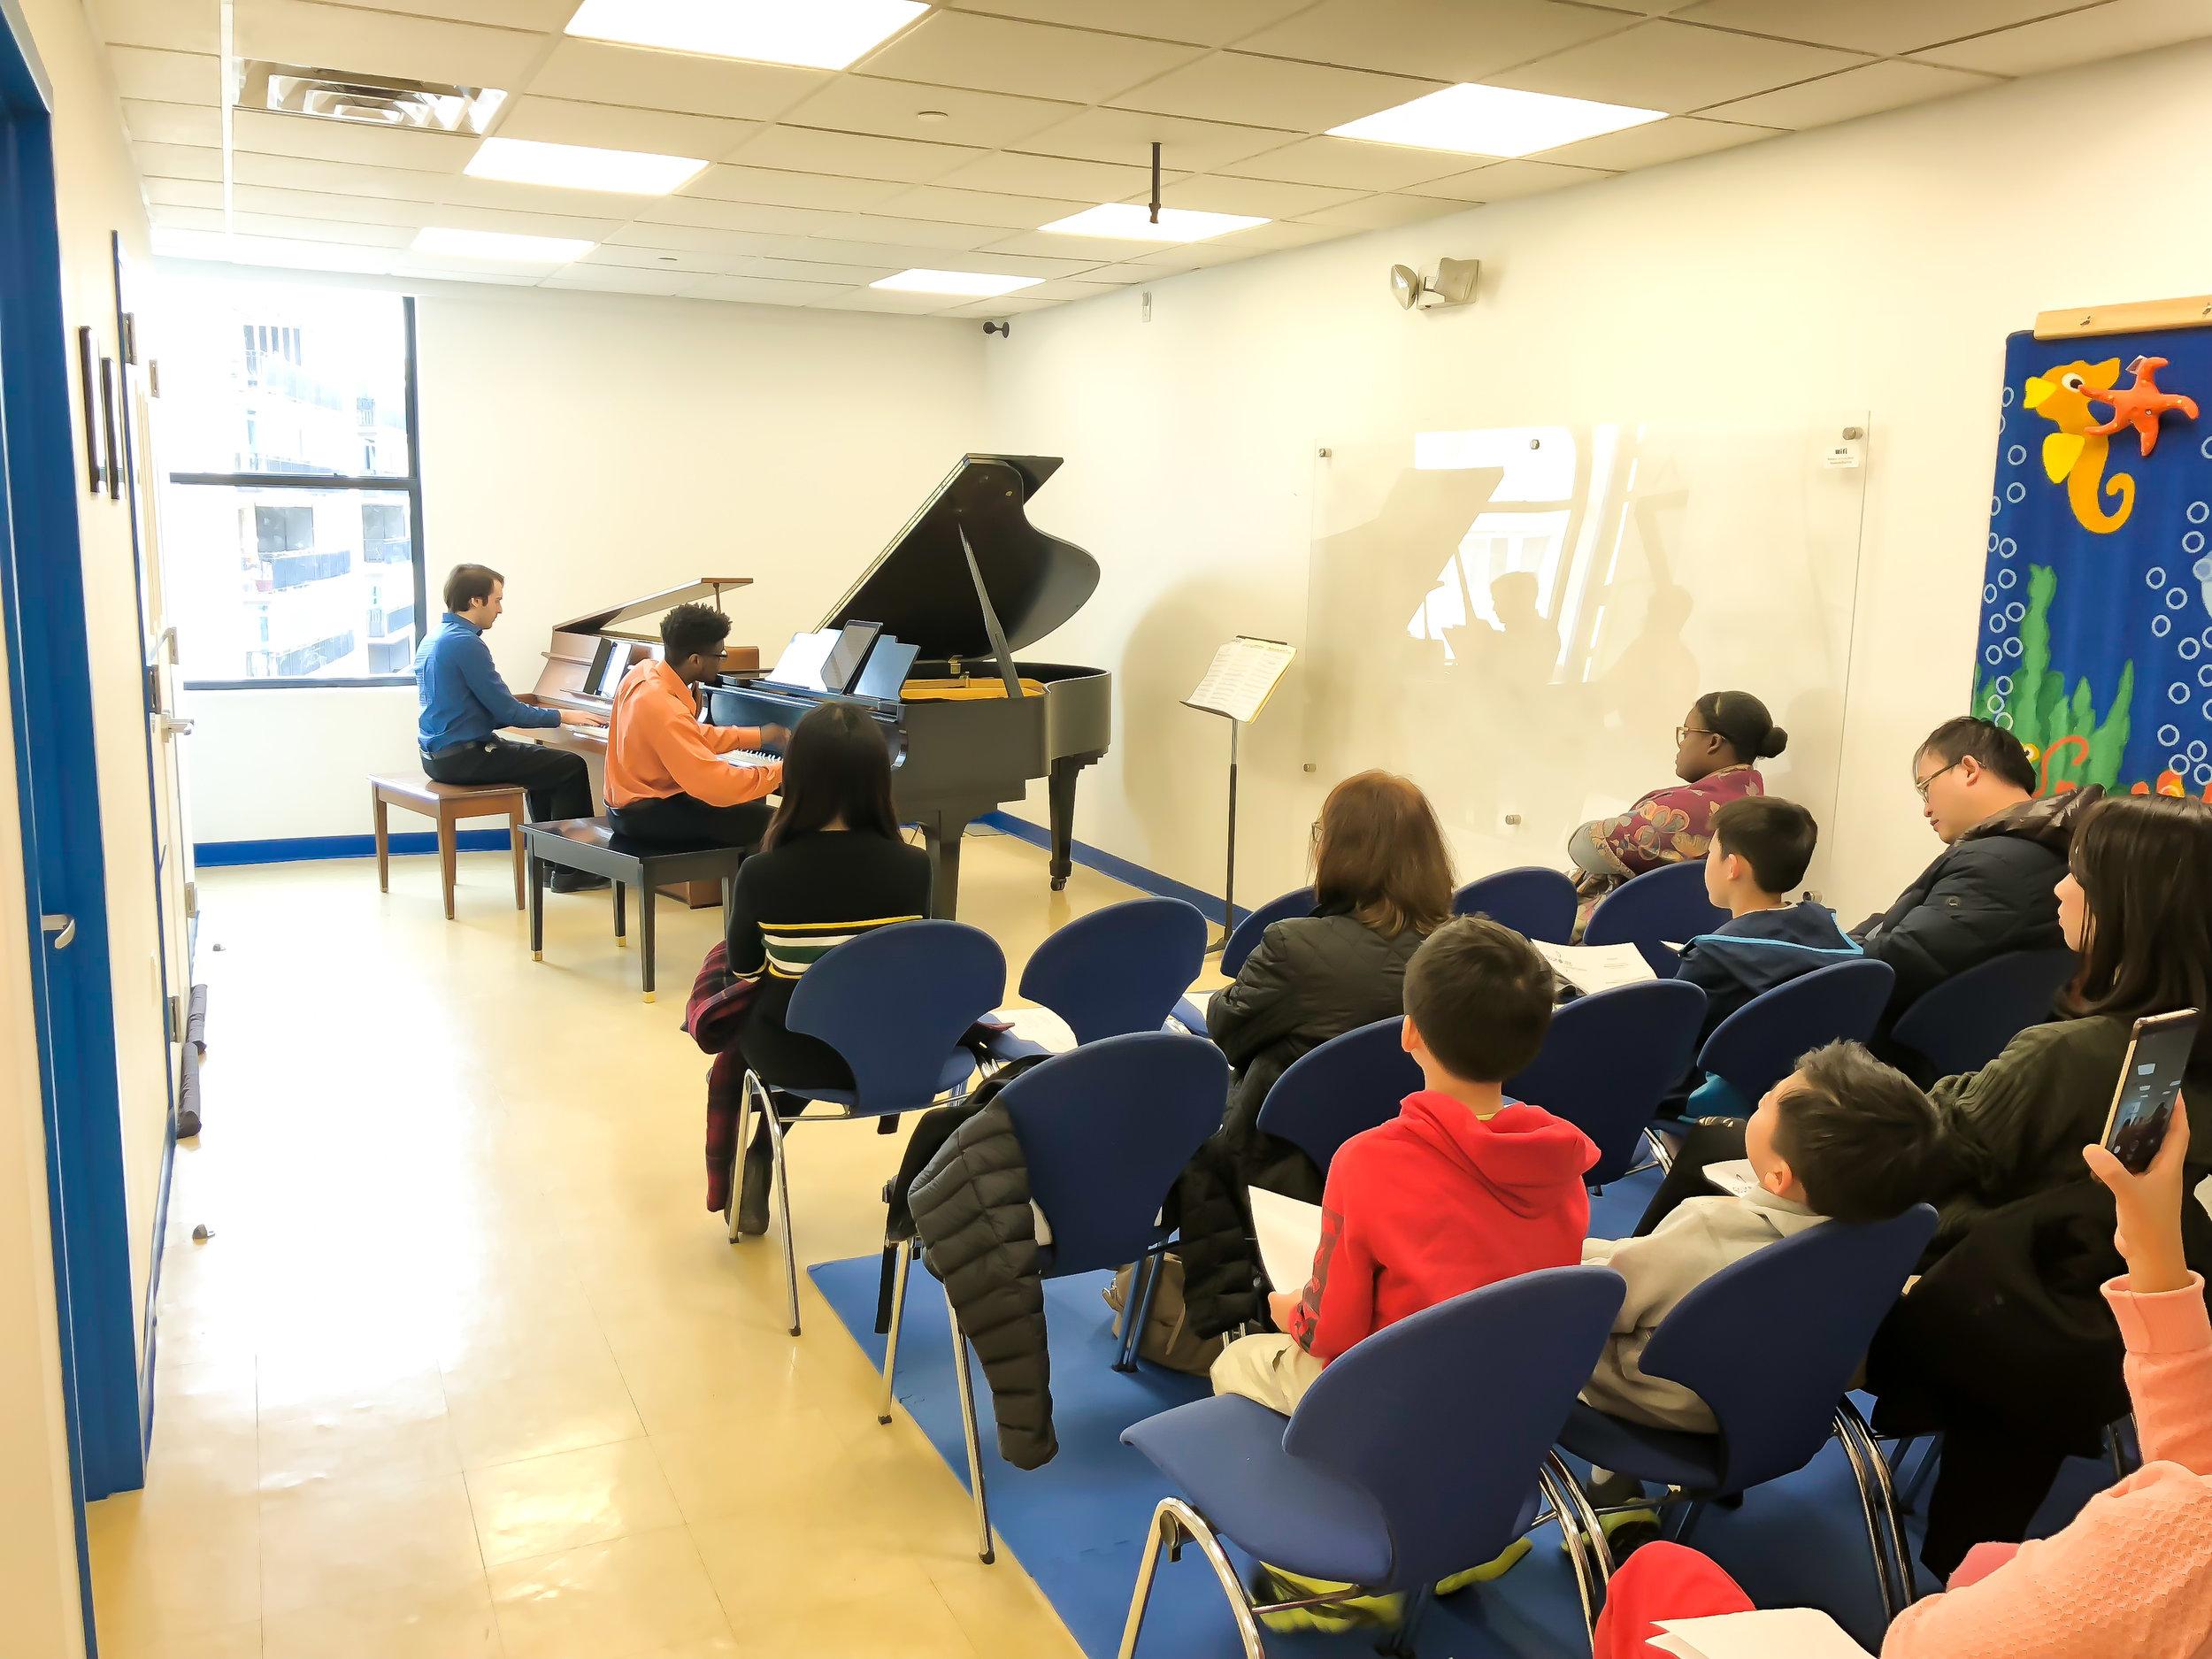 soundplay-concerts-fort-lee-piano.jpg